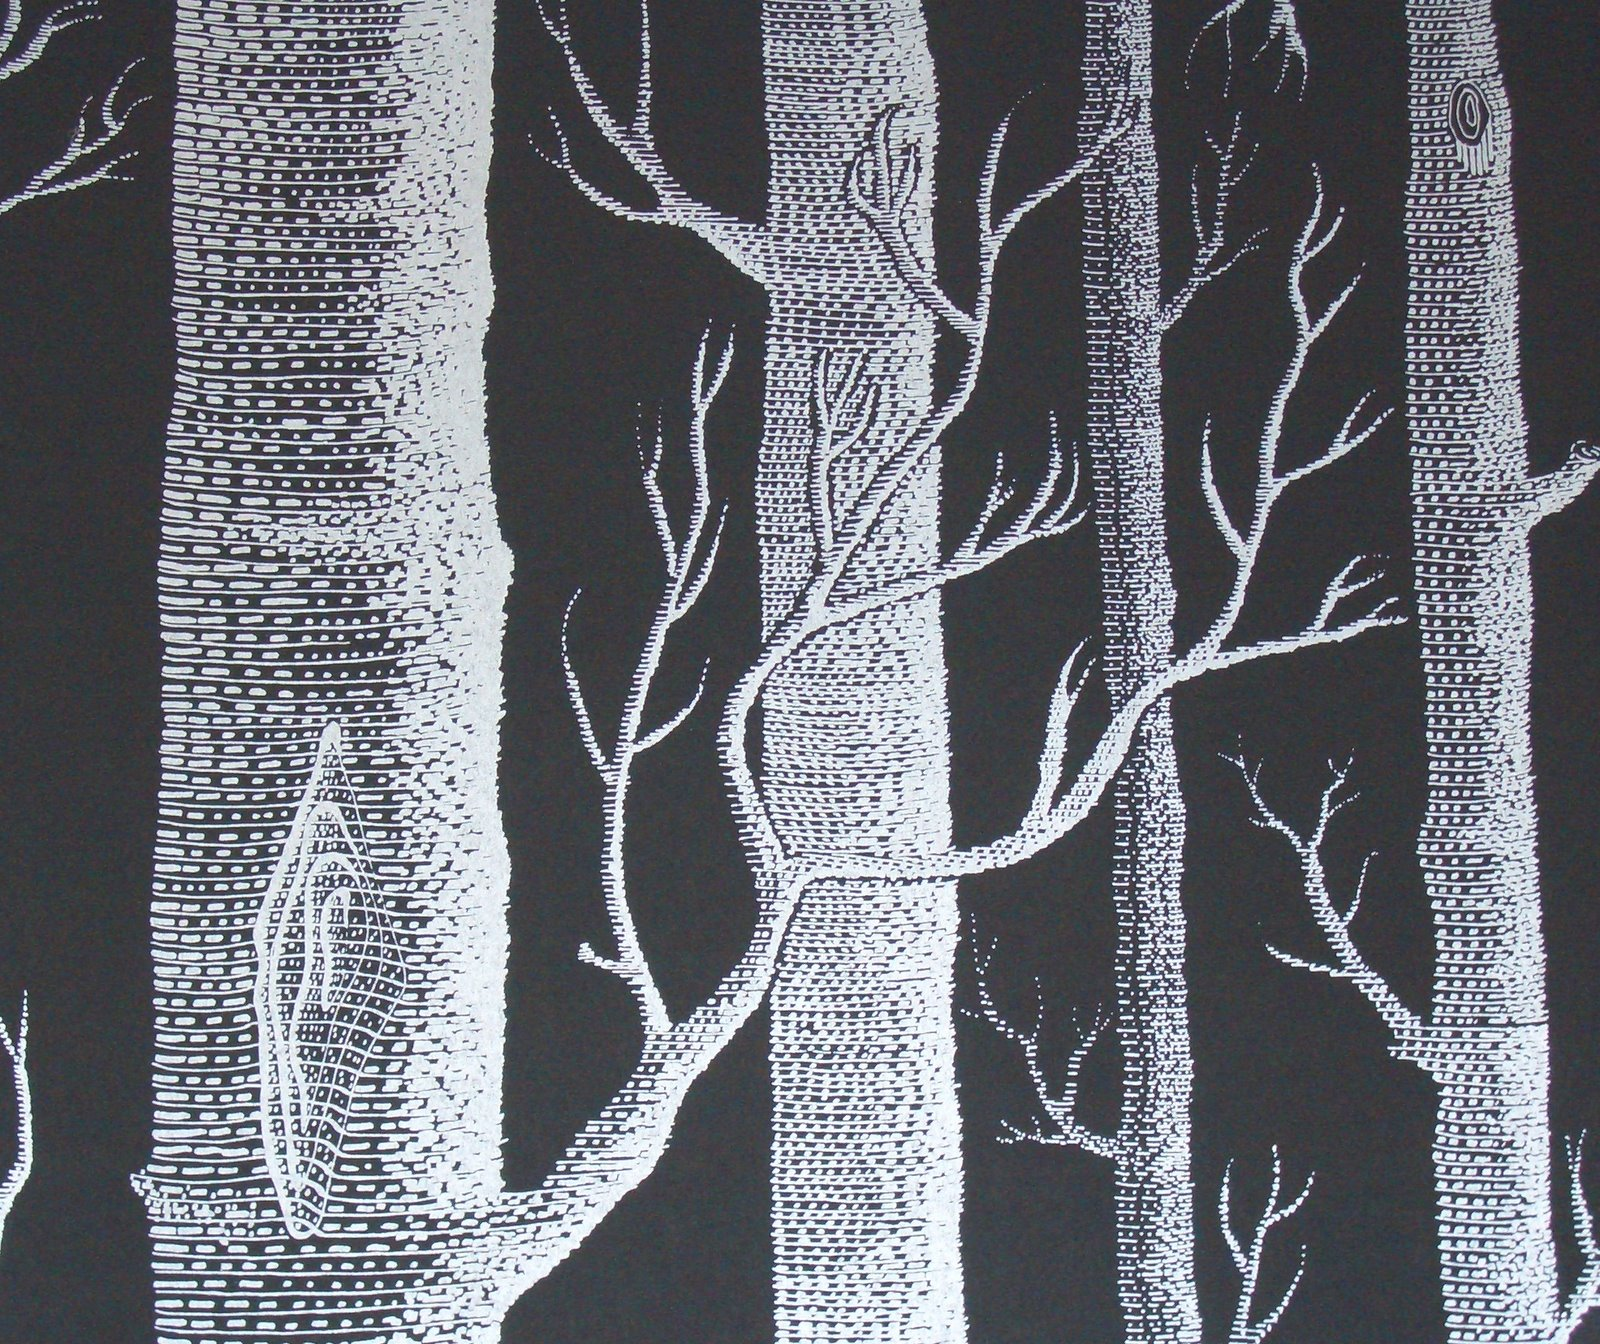 wallpaper wallpaper cole son woods. Black Bedroom Furniture Sets. Home Design Ideas